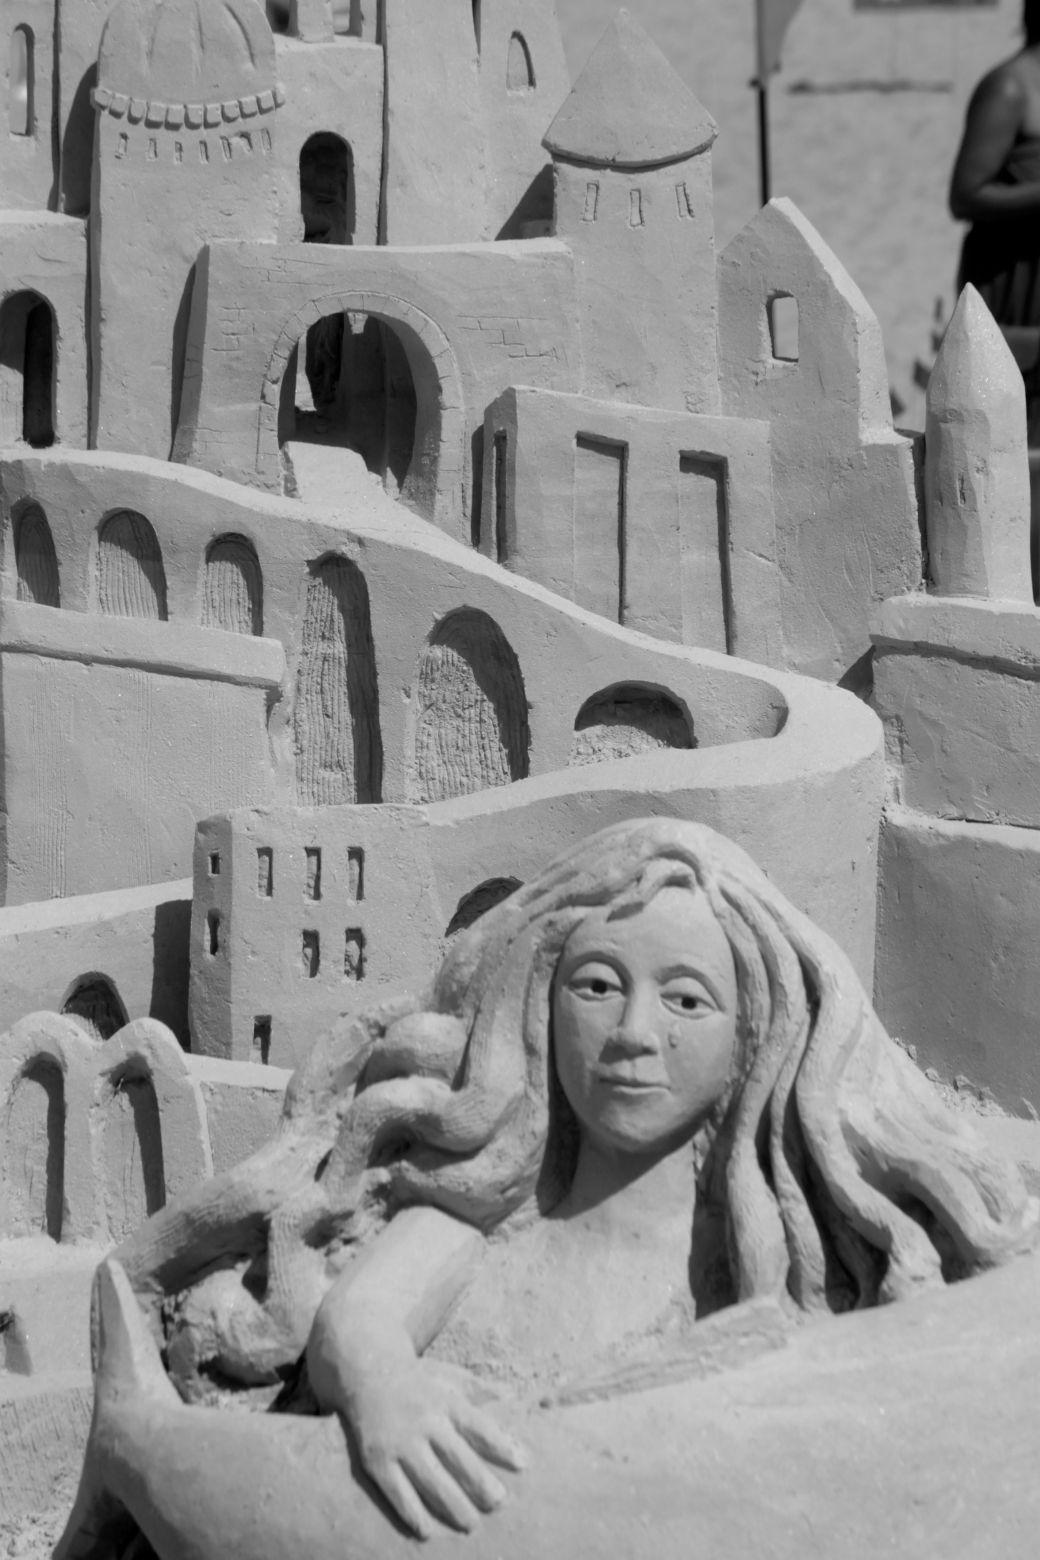 boston revere beach National Sand Sculpting Festival curving castle woman